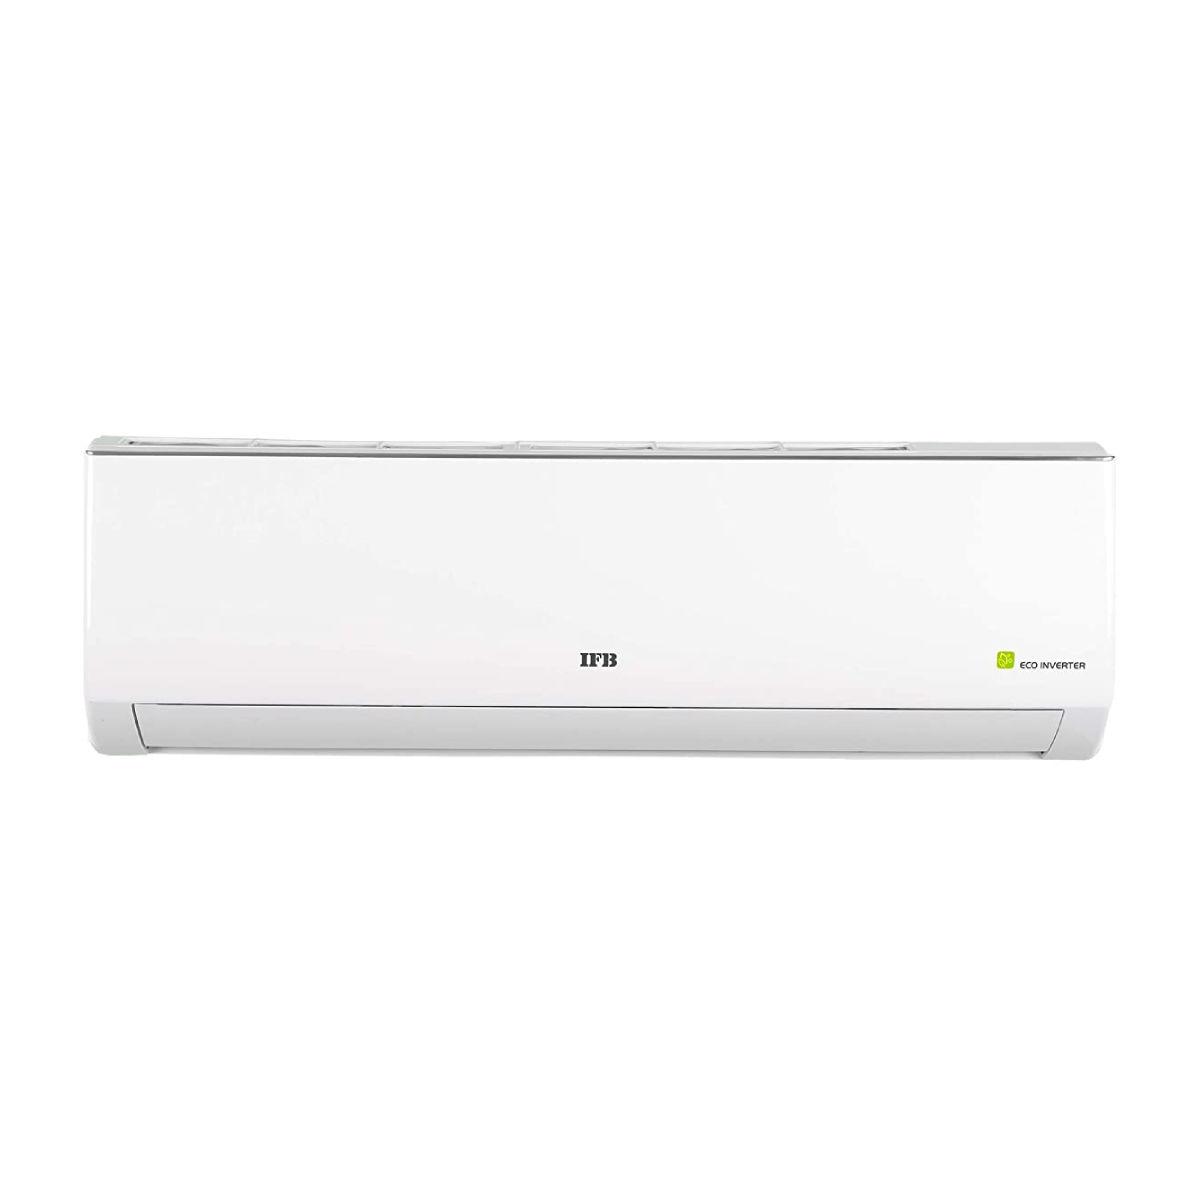 आई.एफ.बी. IACI24X83T3C 2 Ton 3 Star Inverter Split Air Conditioner